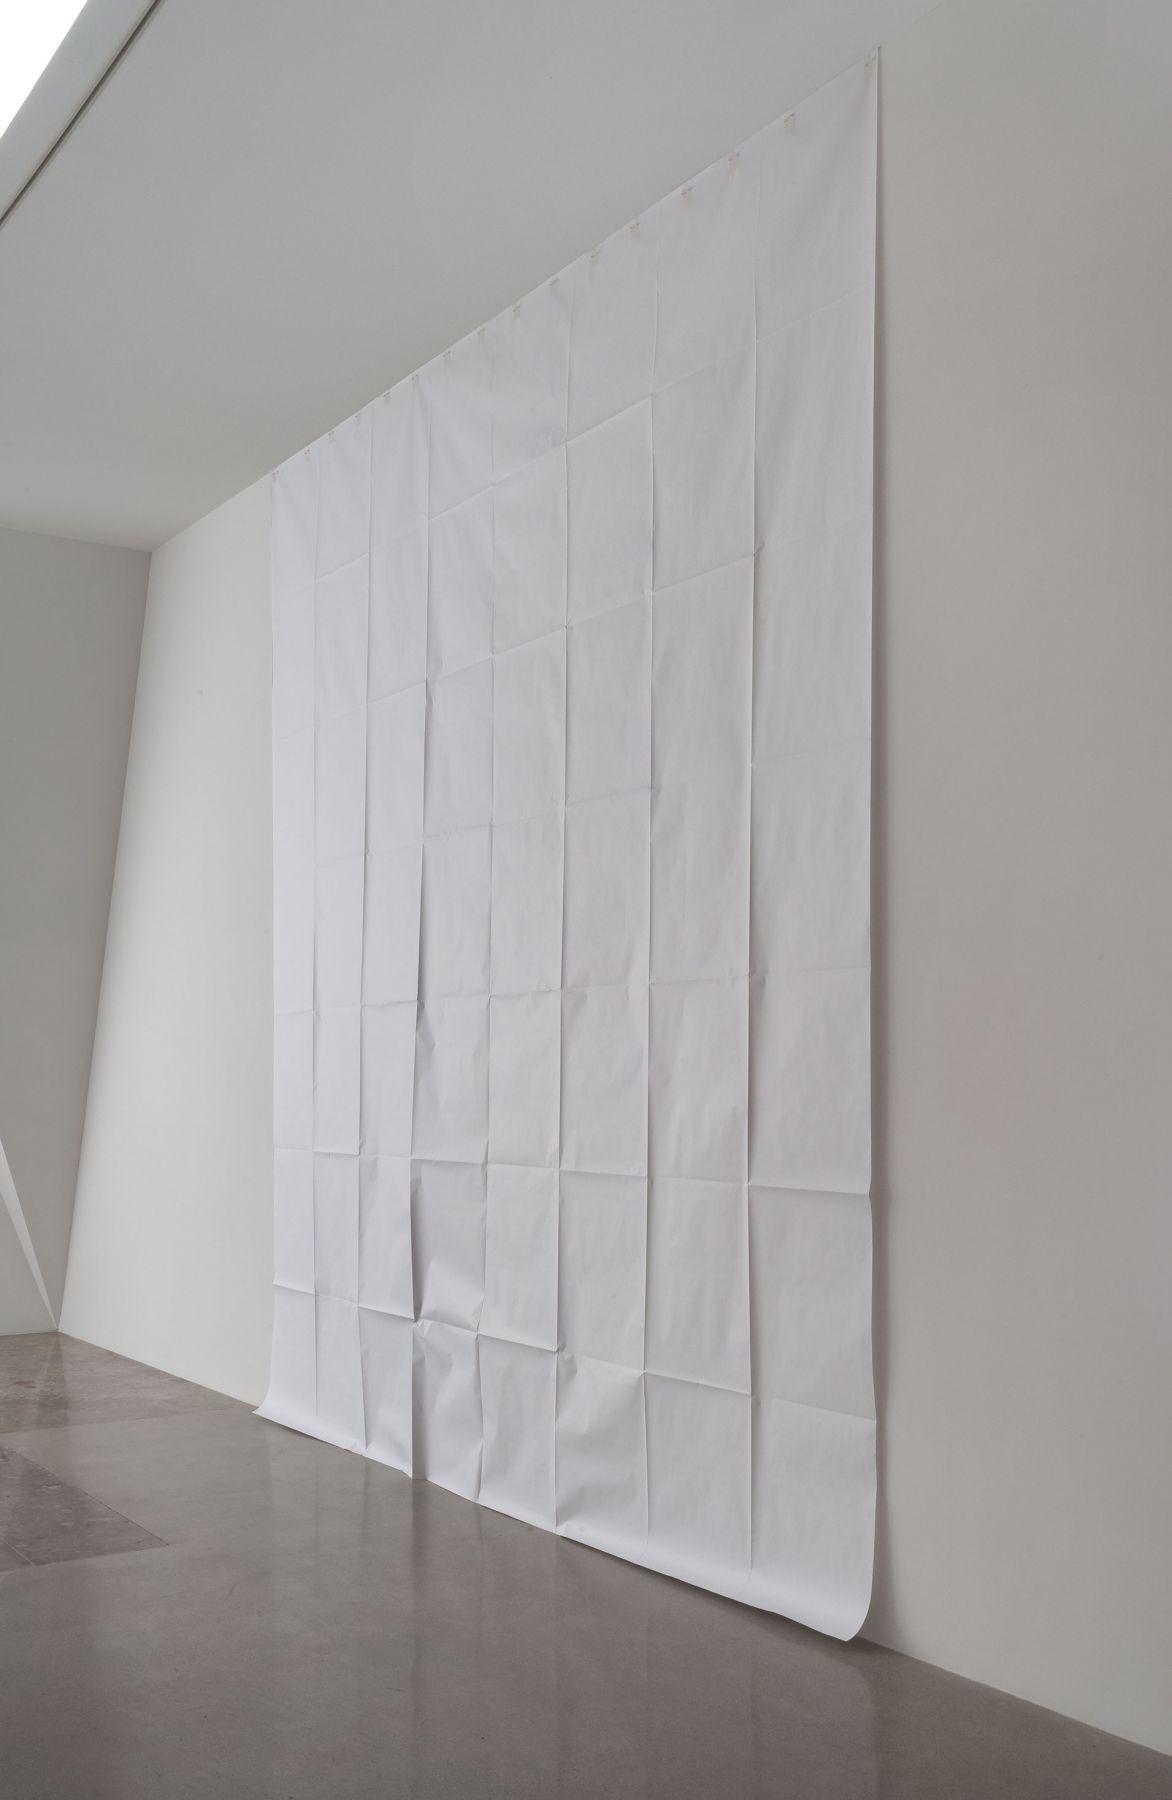 David Lamelas, Paredes doblade (Doubled Wall)